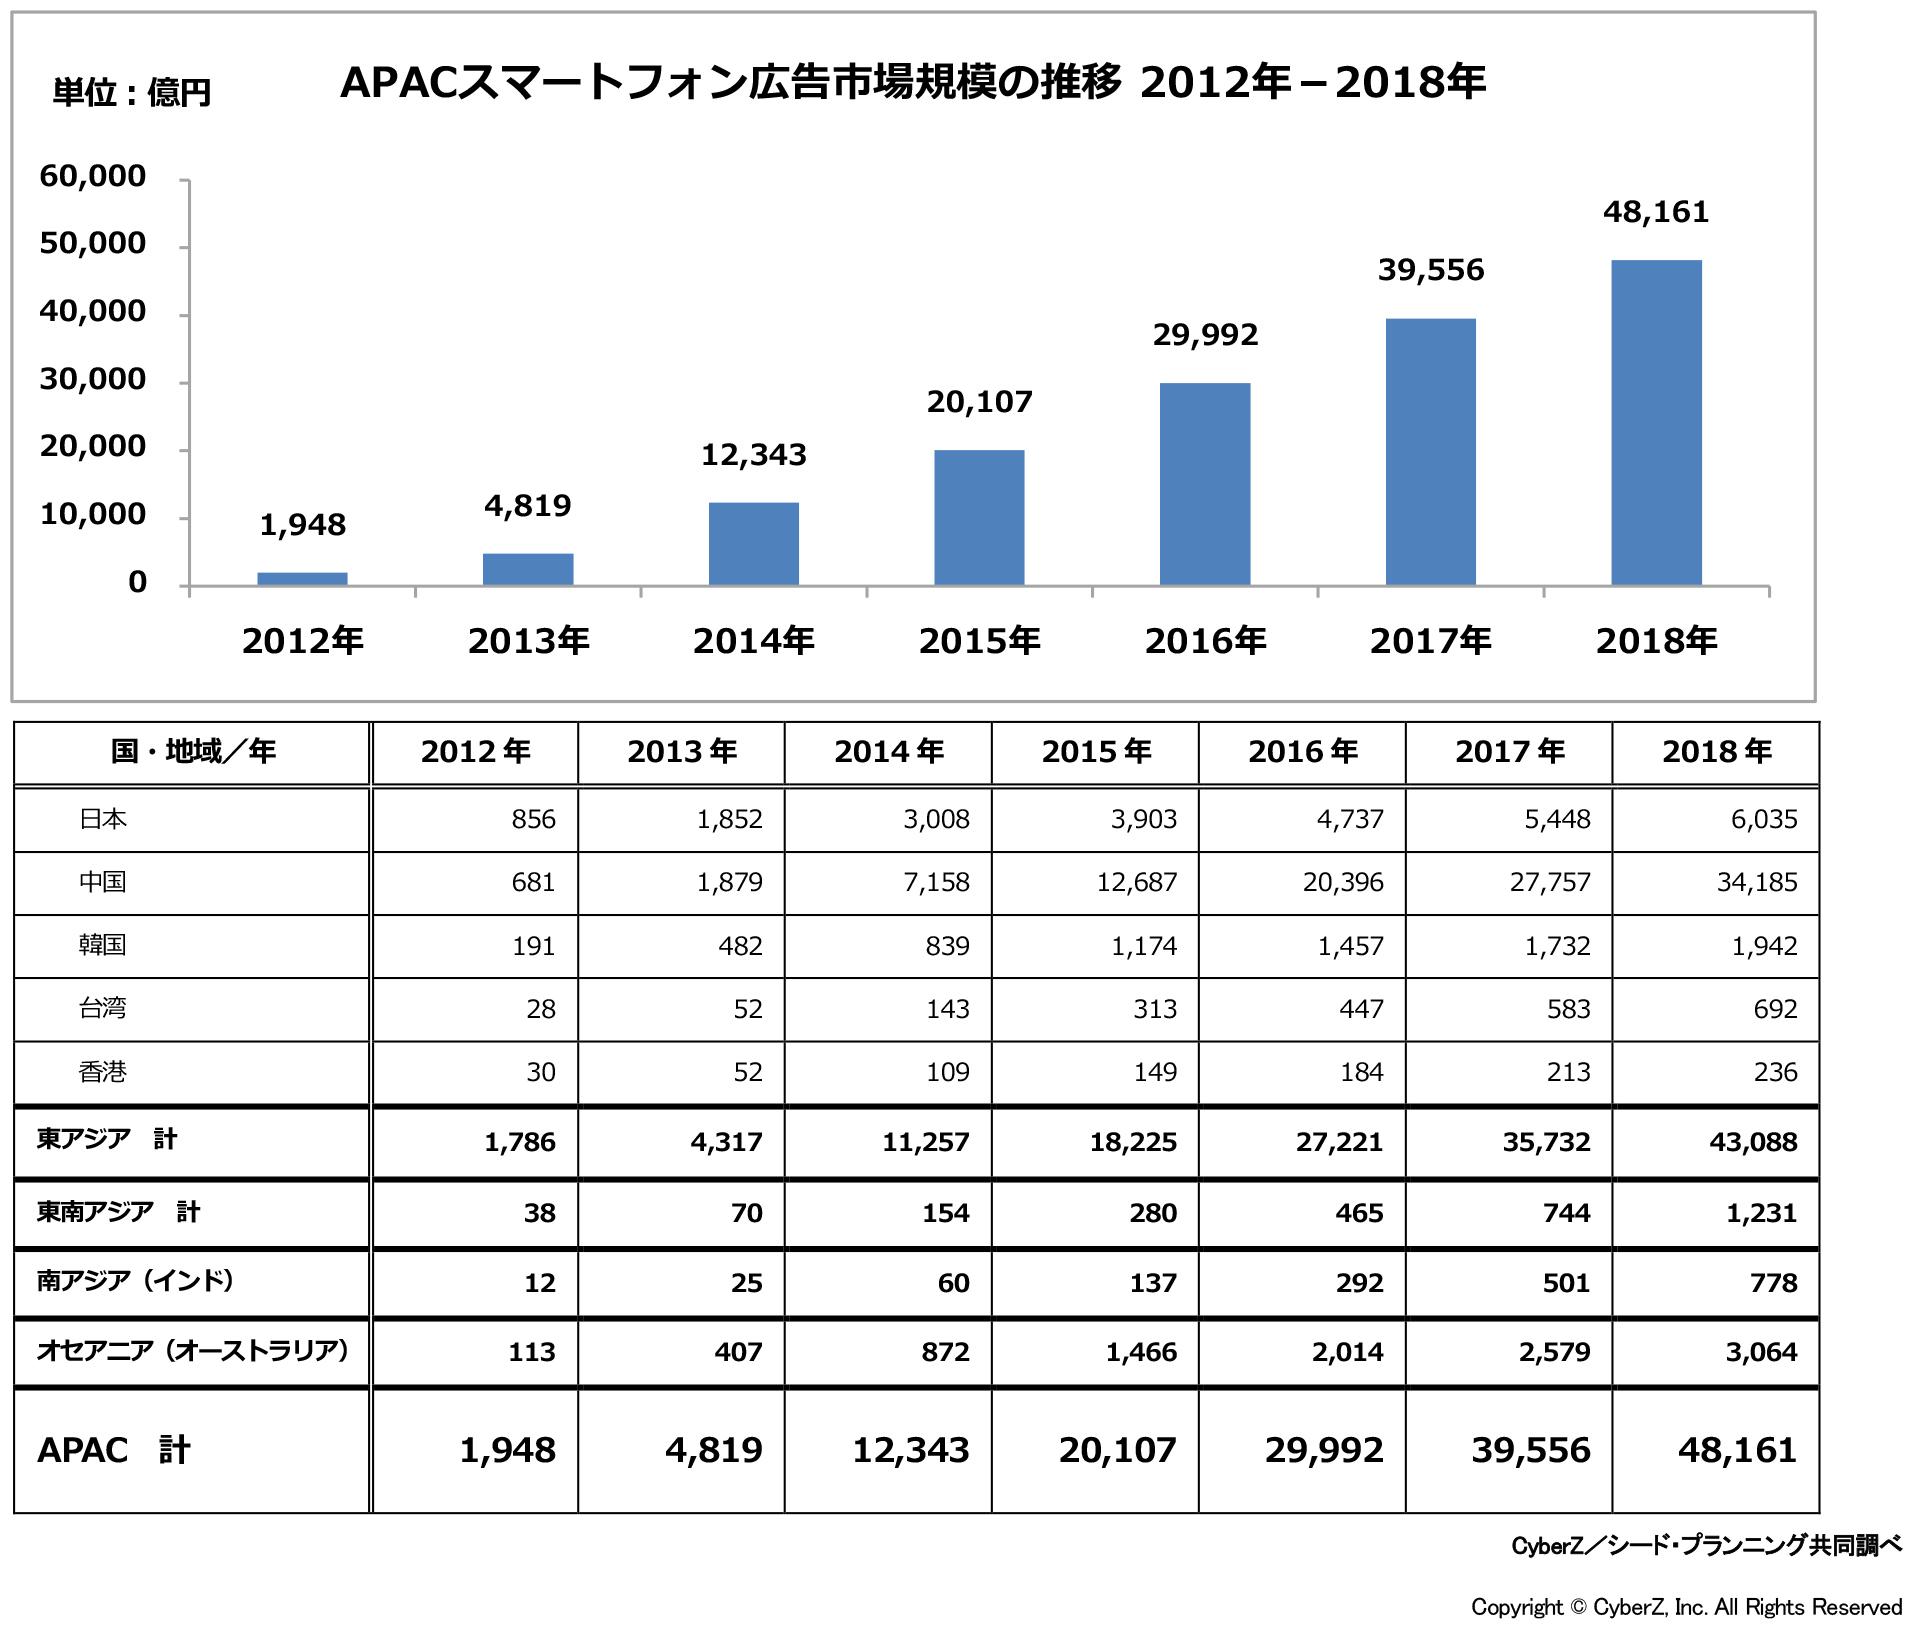 APACスマートフォン広告市場規模の推移2012年-2018年